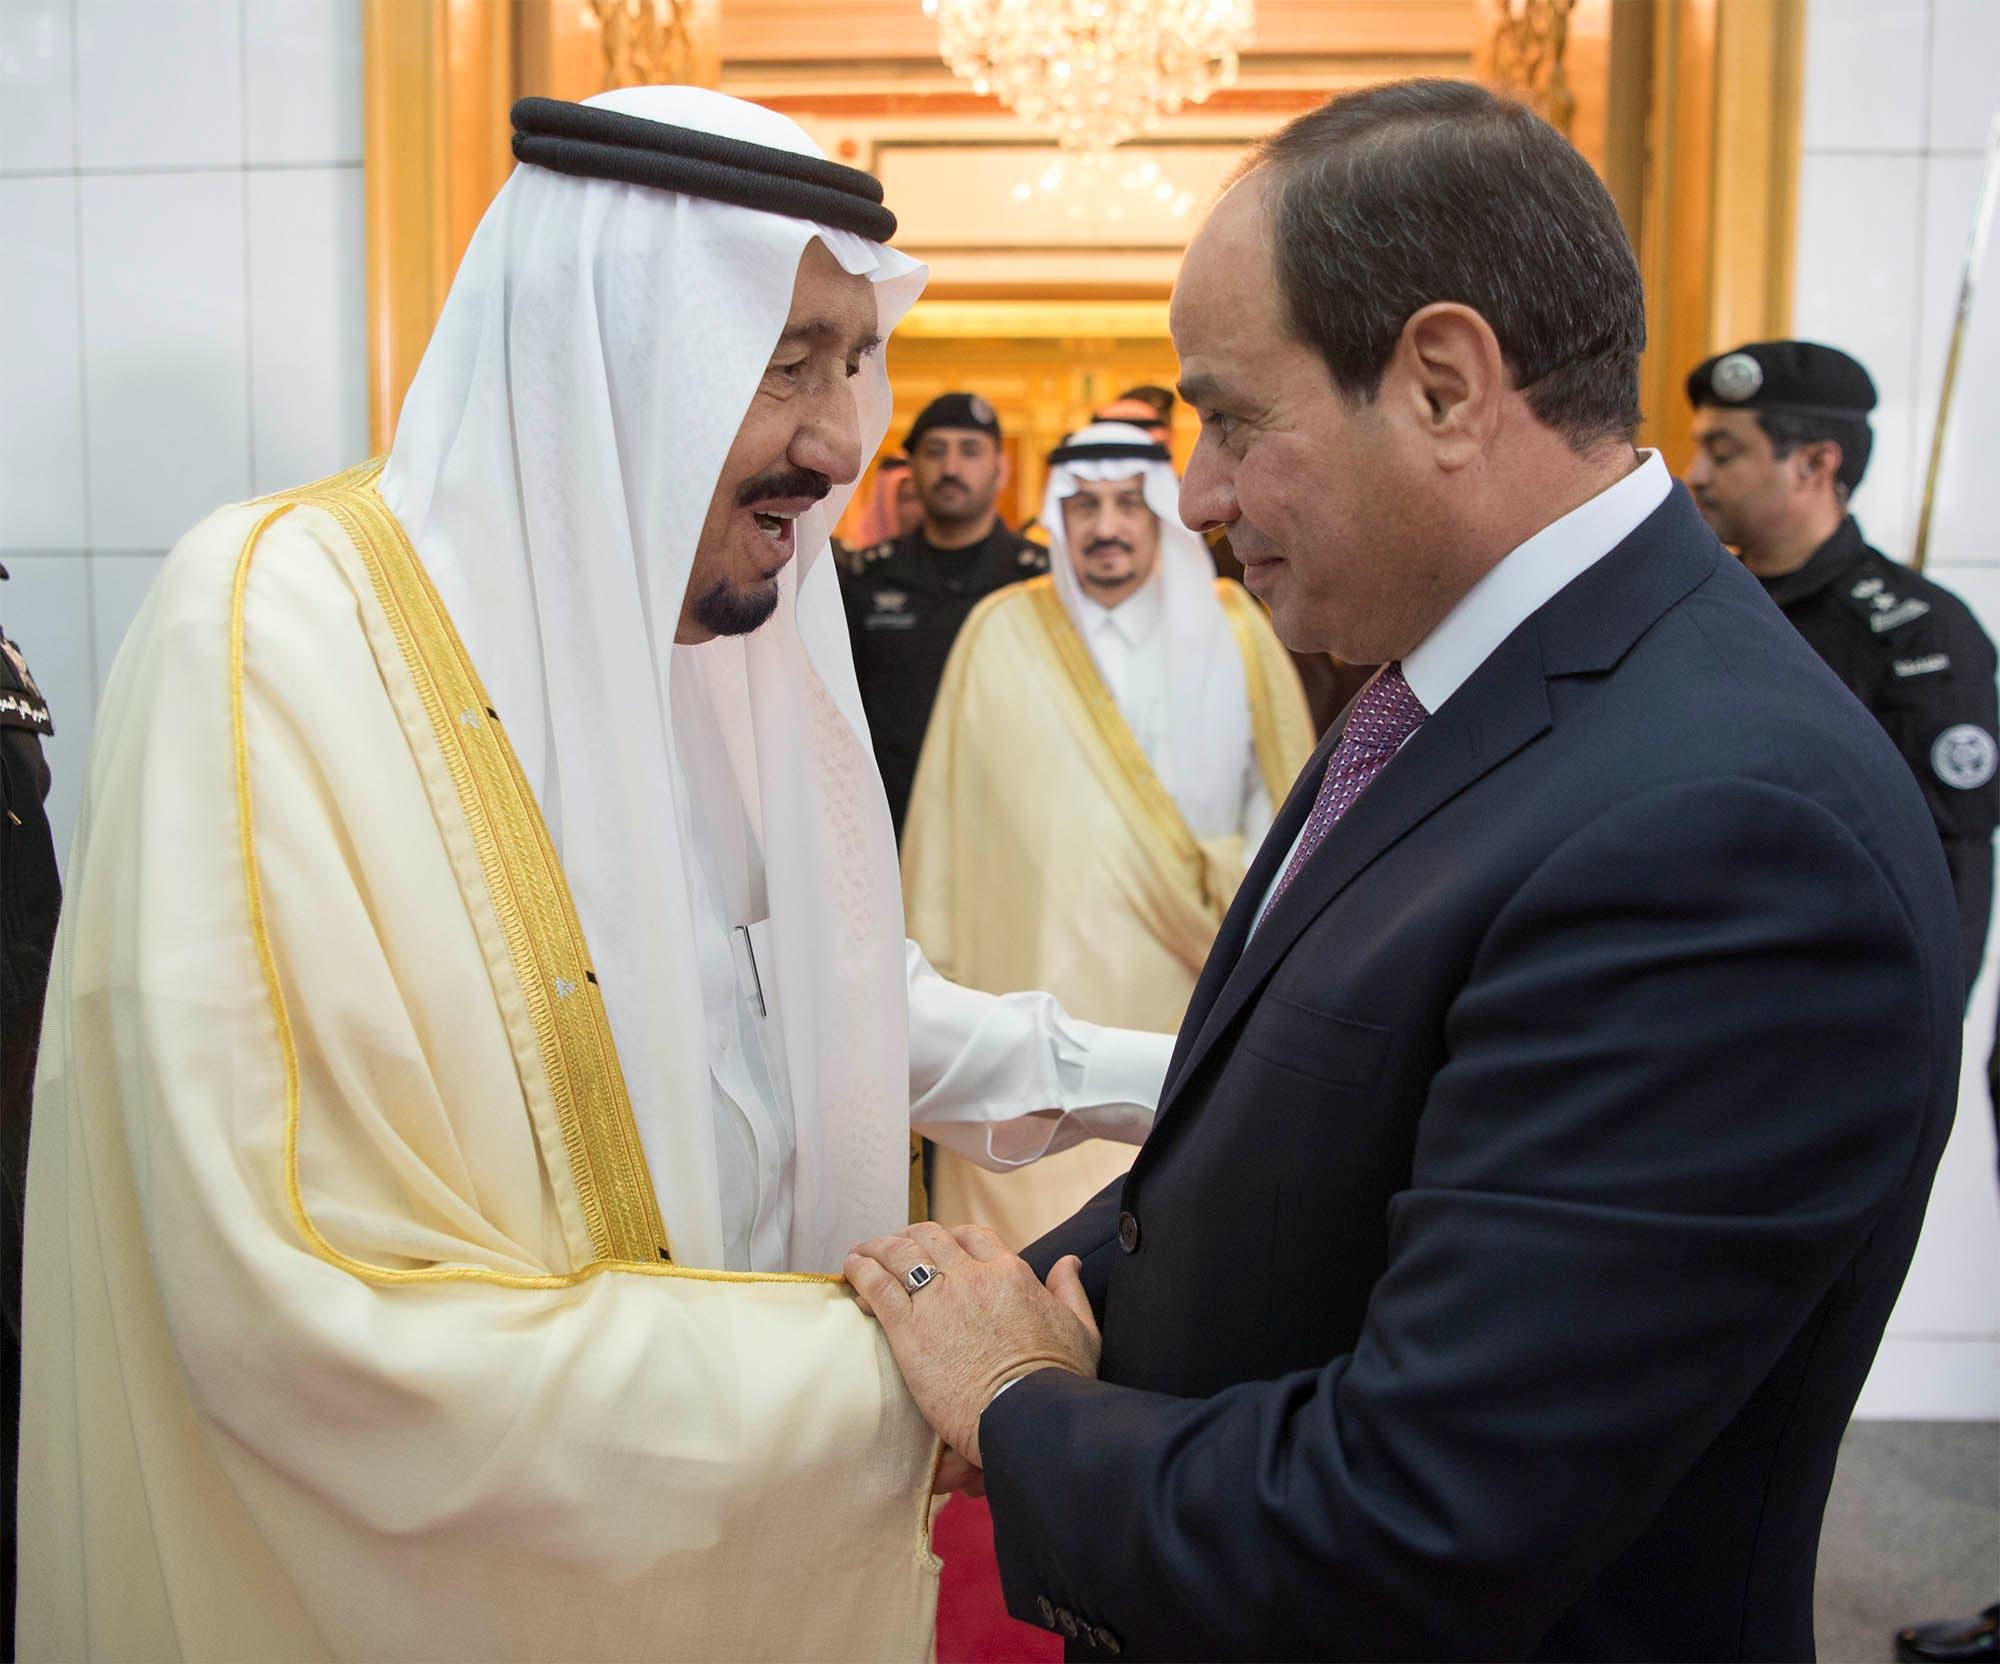 Saudi Arabia's King Salman bin Abdulaziz Al Saud (L) shakes hands with Egypt's President Abdel Fattah al-Sisi in Riyadh, Saudi Arabia April 23, 2017. (File photo: Reuters)